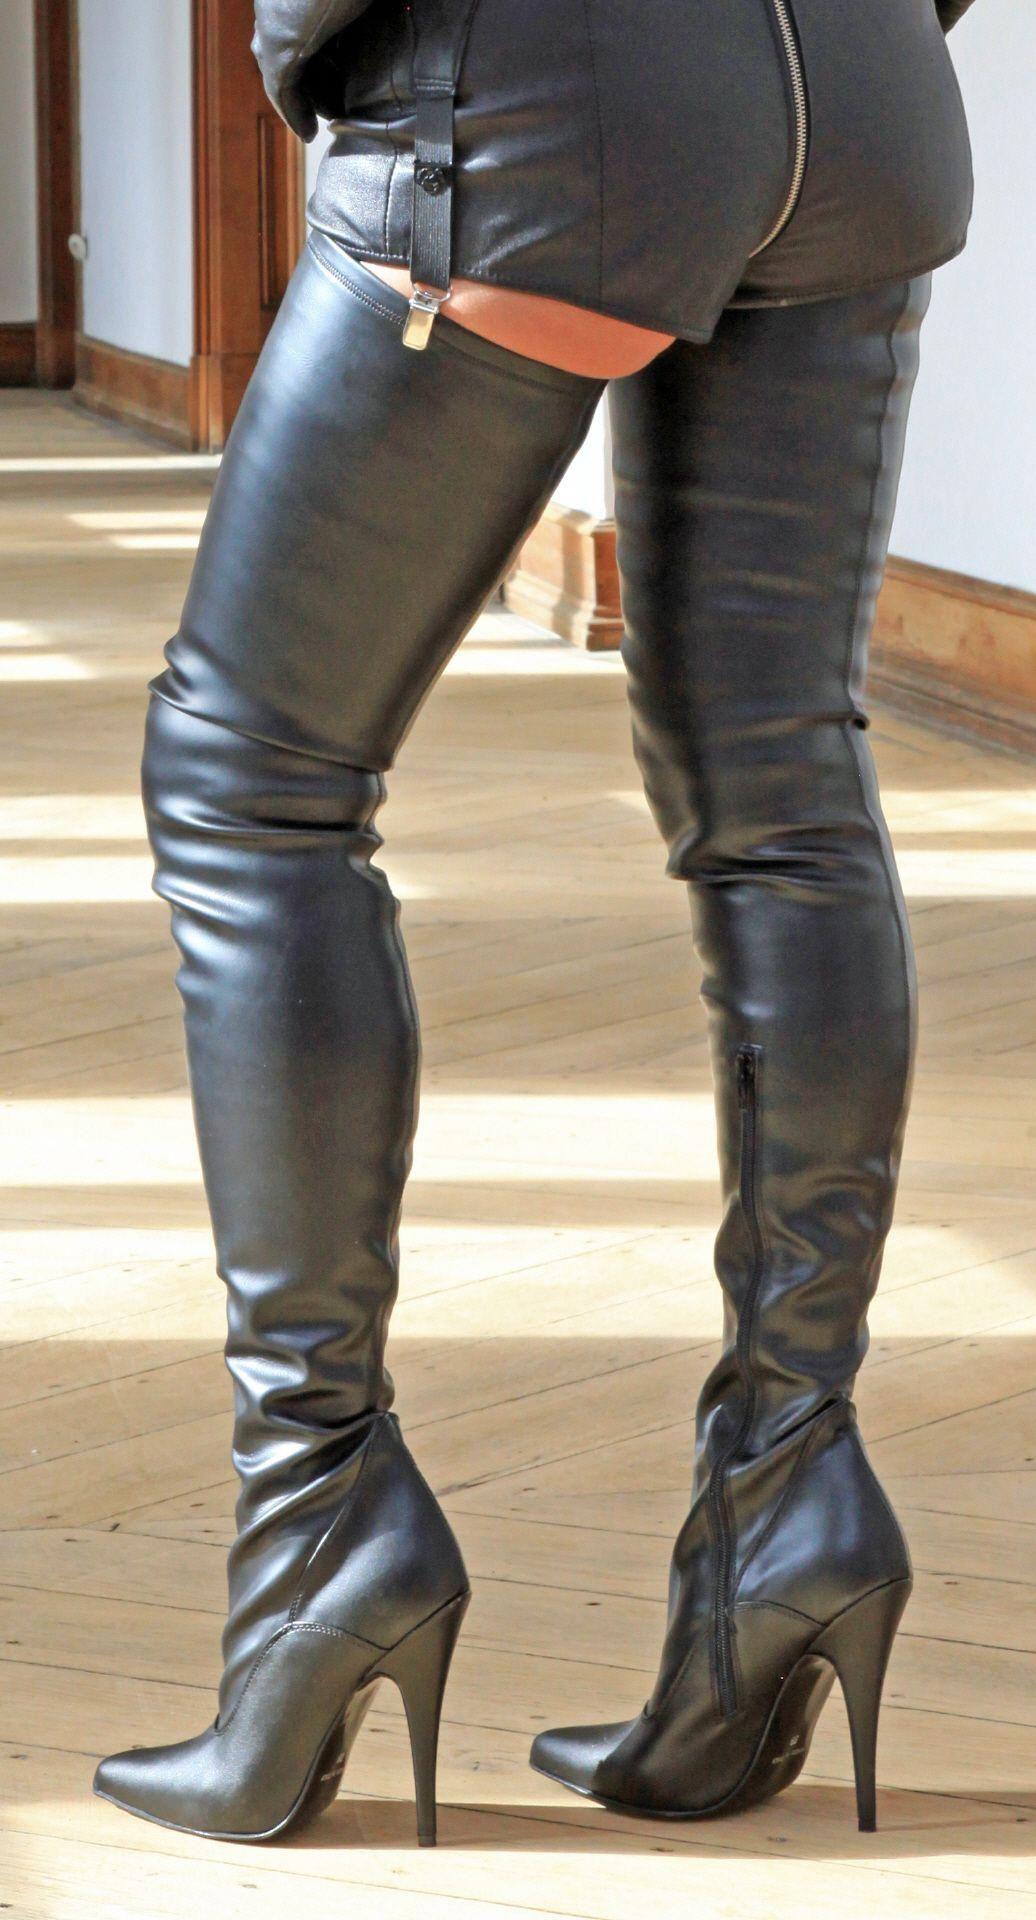 Schwarze Crotch Overknee Stiefel von MICELI #Highheels in